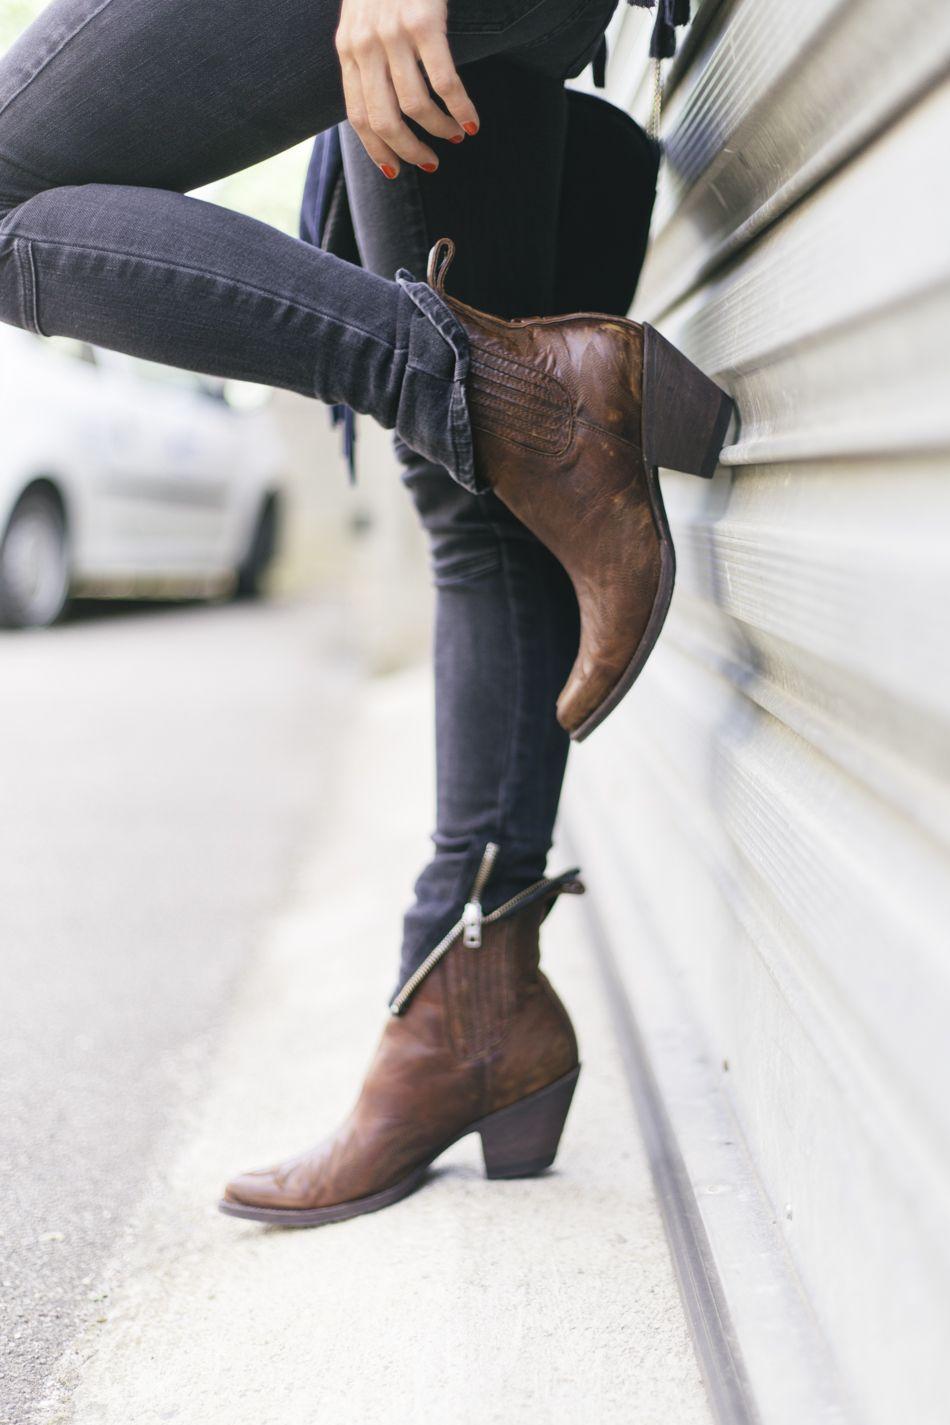 Shoe Peu PloucShoesShoes Bofun Boots Fashion 5AR34Lj